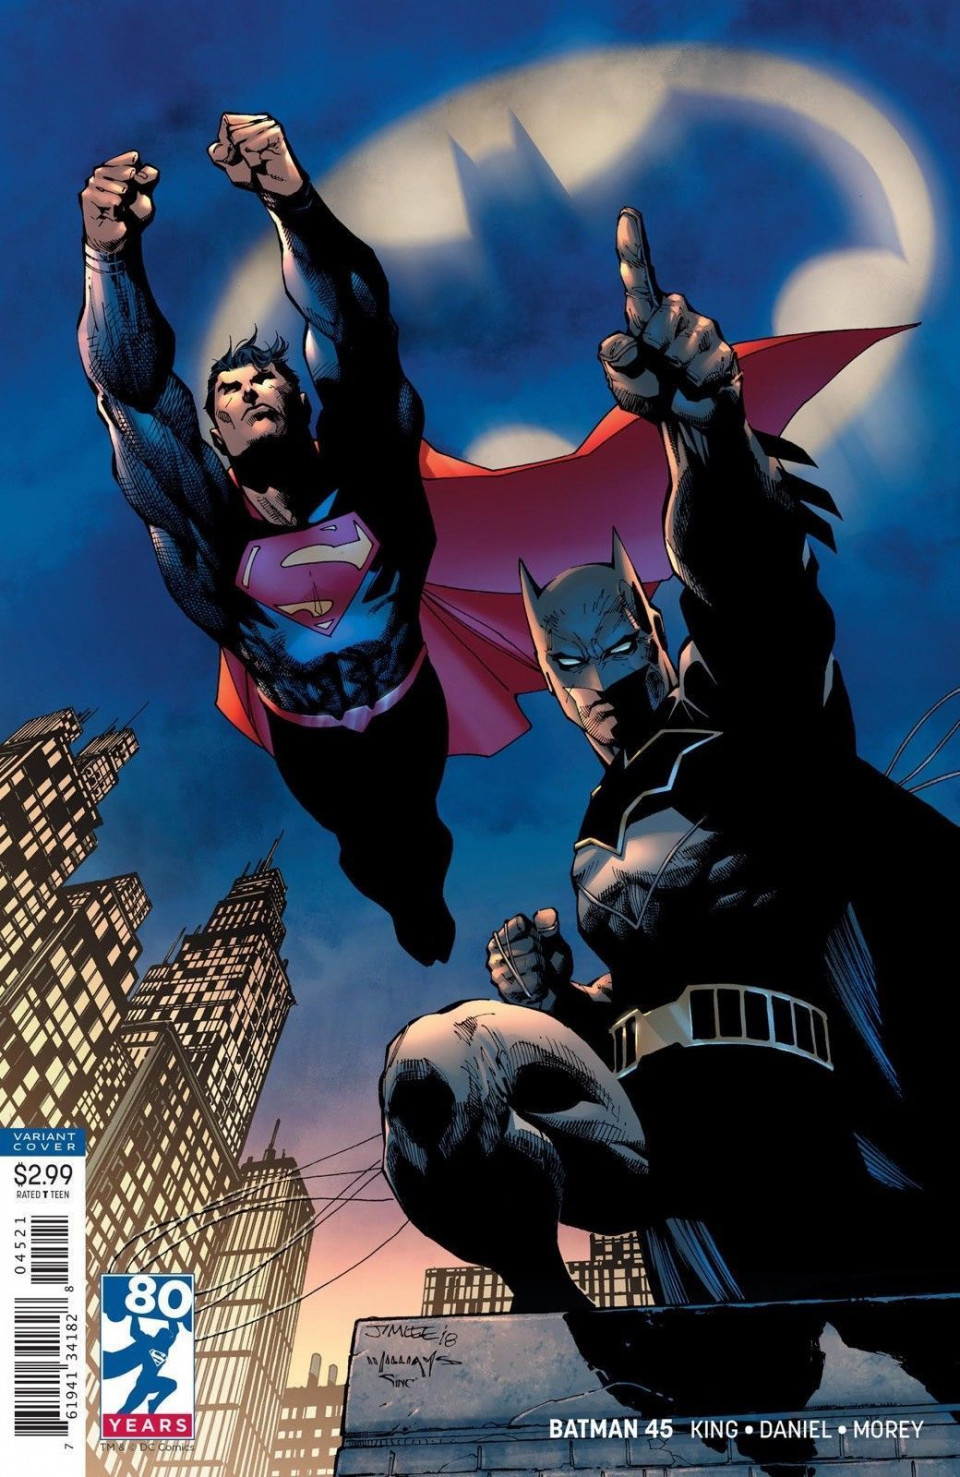 Jim Lee DC Comics Batnan Superman